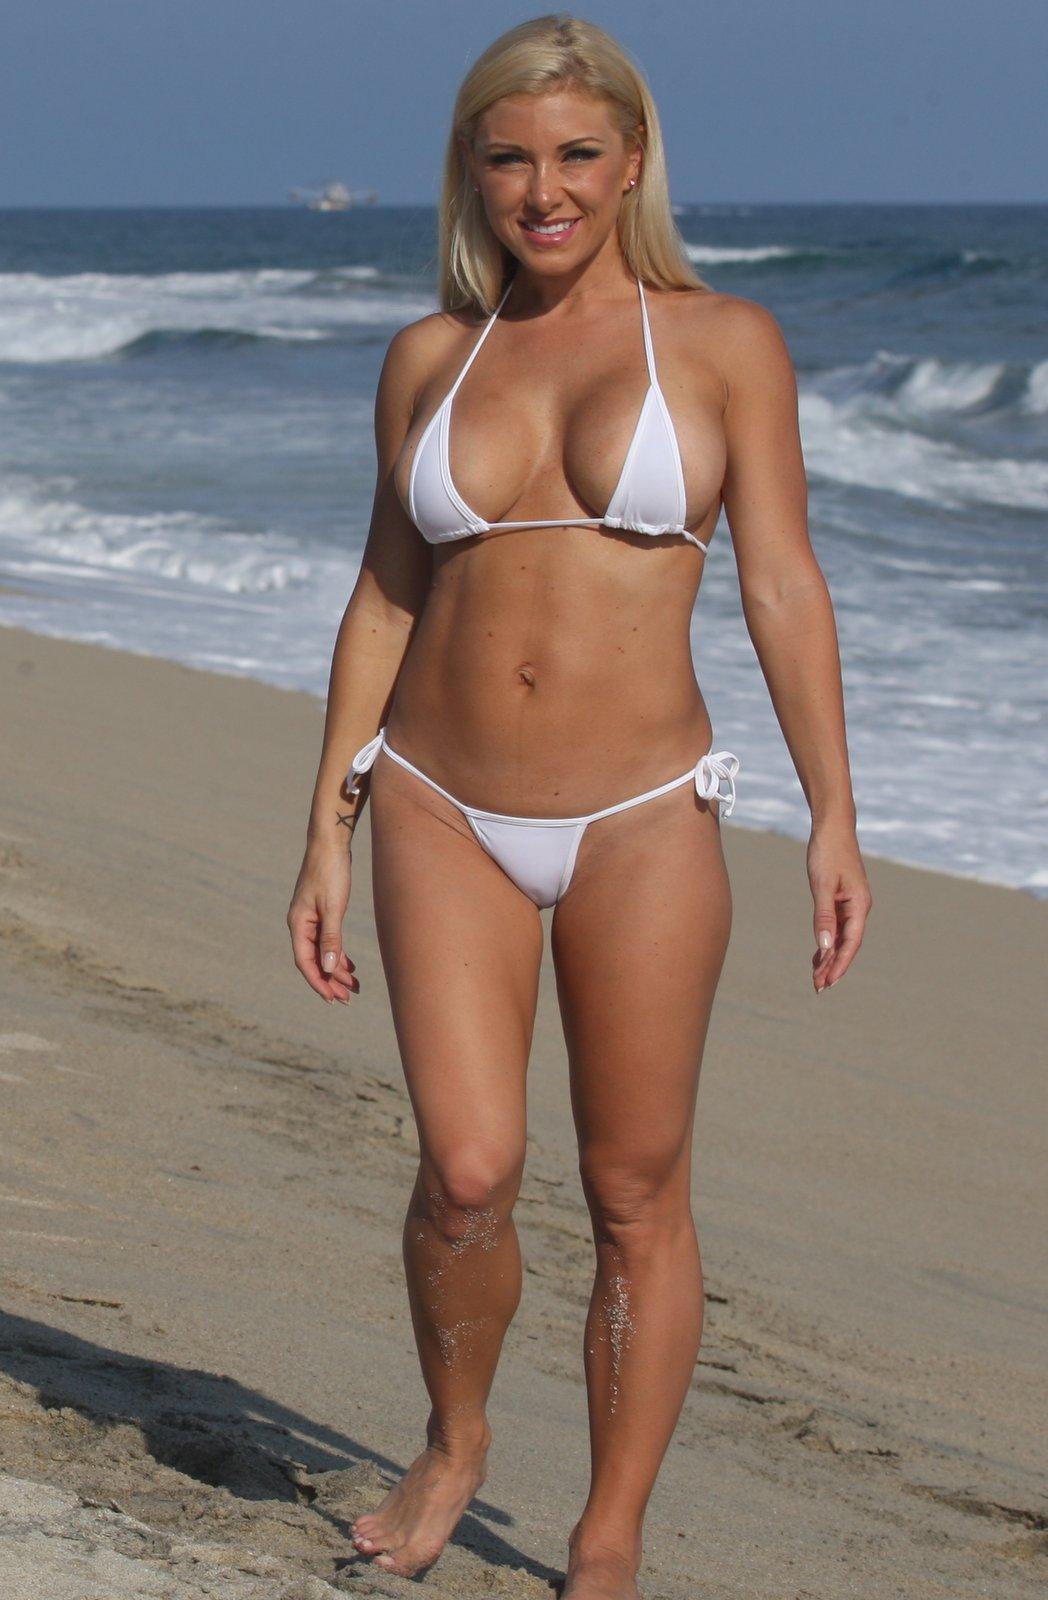 Rachel true bikini